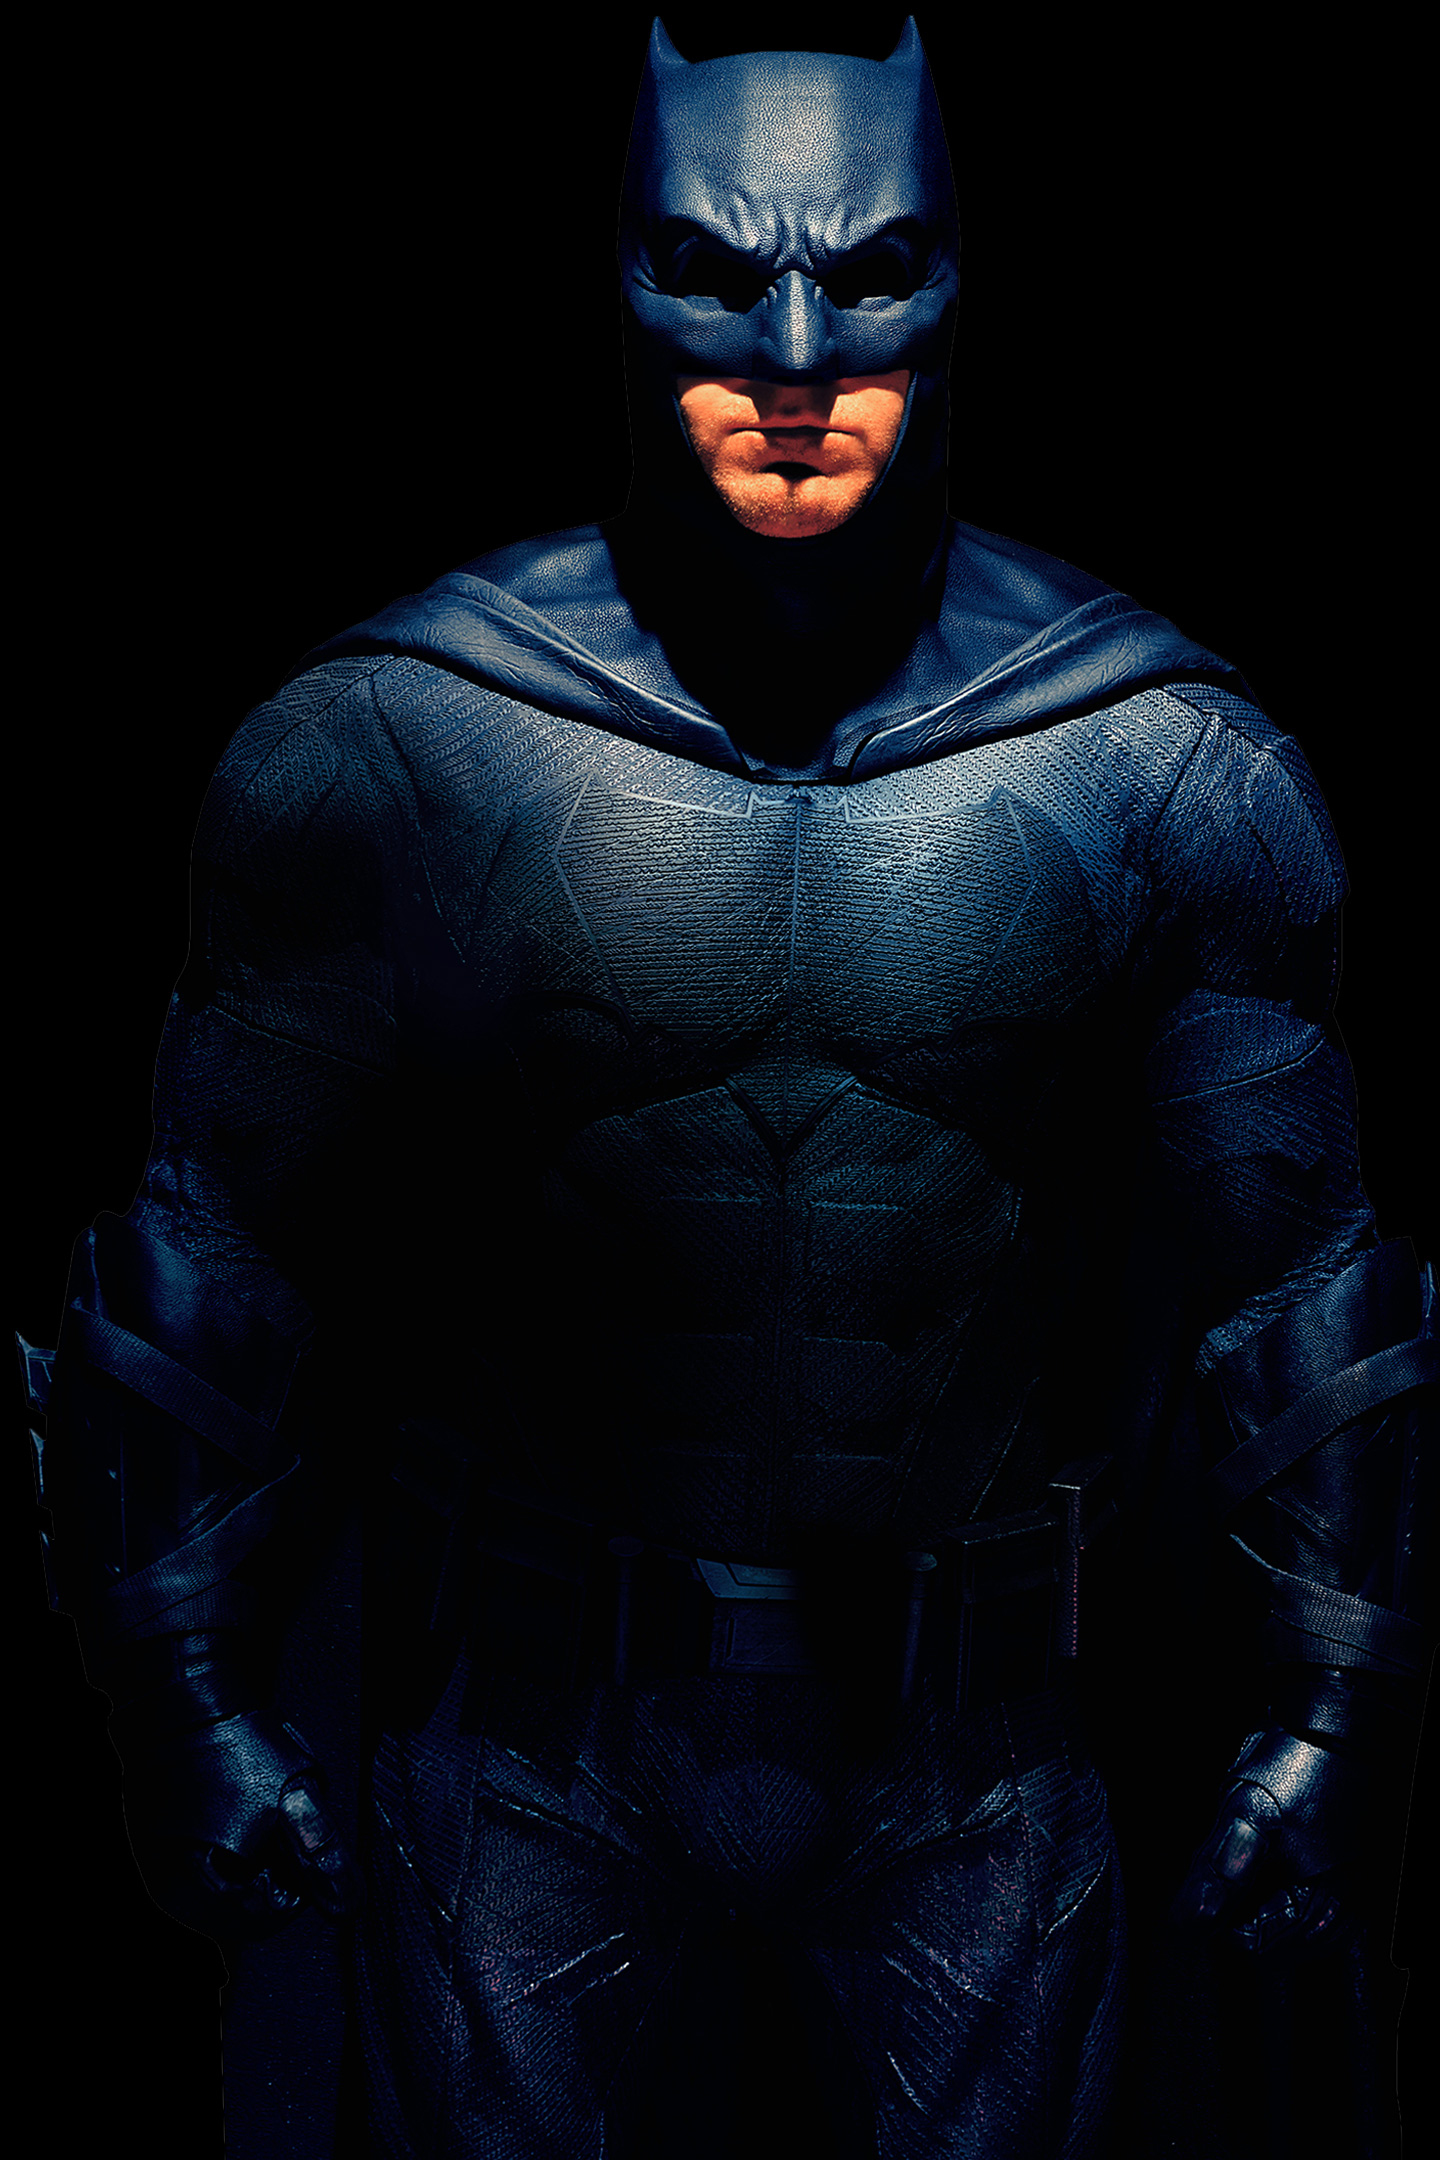 Batman Superhero Justice League Movie 2017 1440x2880 Wallpaper